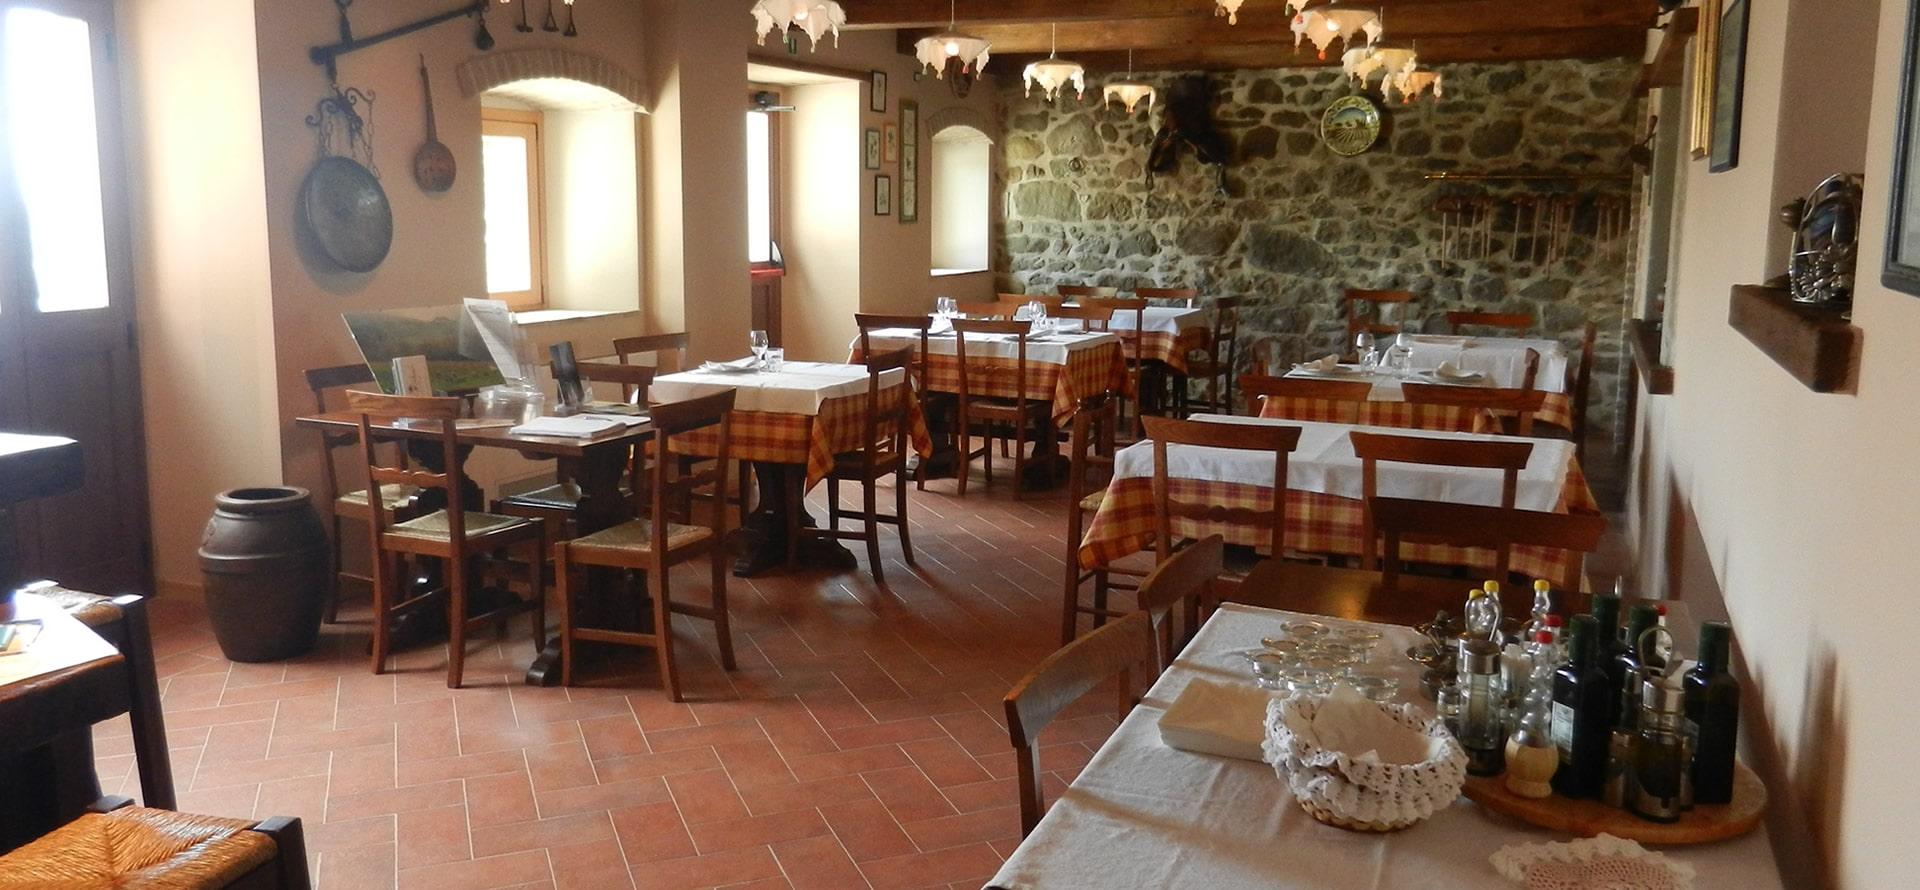 Sala ristorante toscano a Caprese Michelangelo